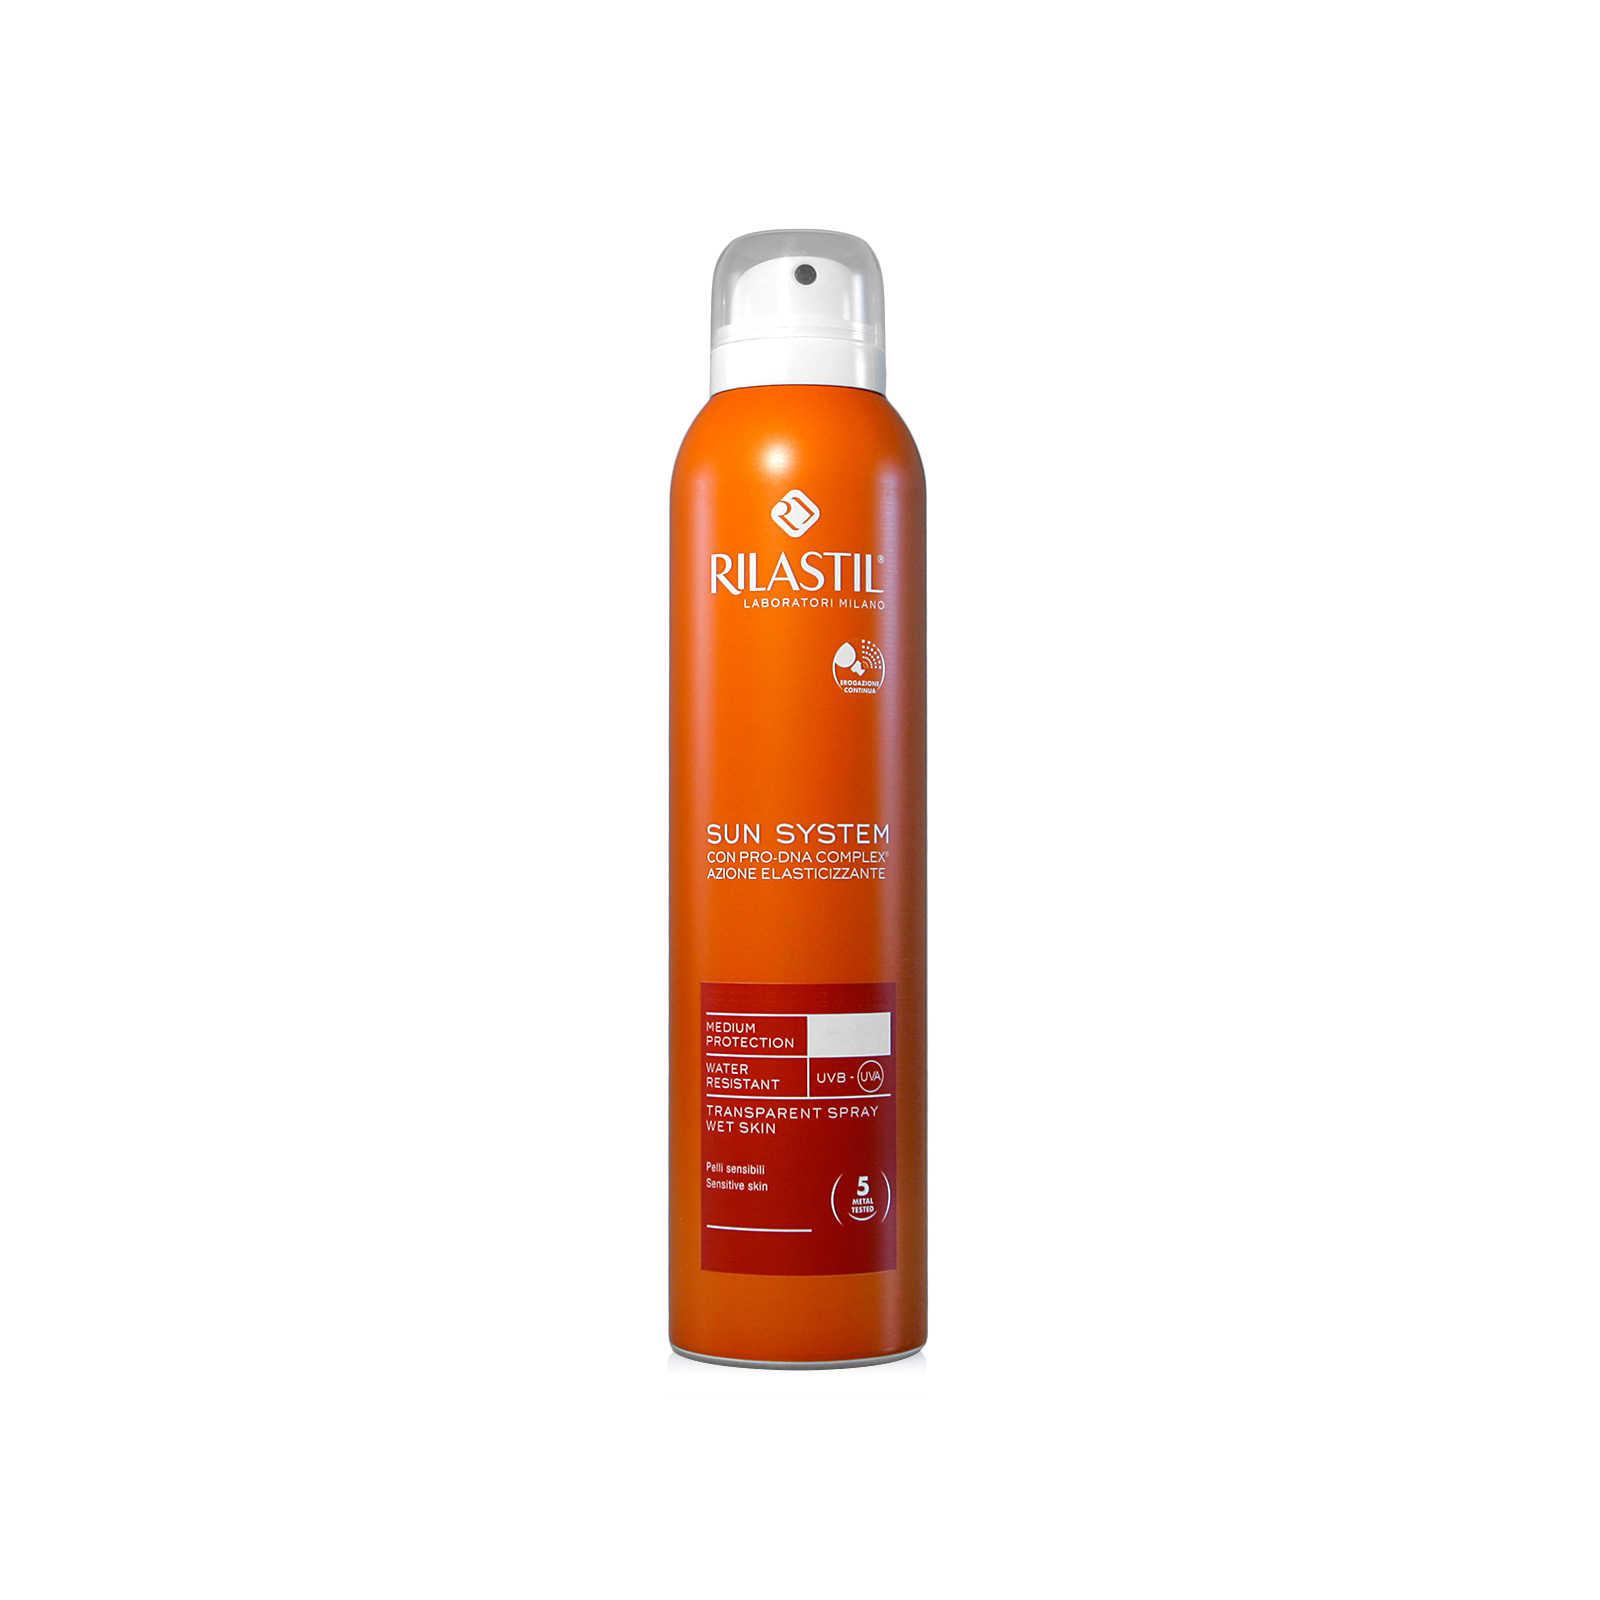 Rilastil - Sun System - Spray Protezione solare Trasparente - SPF30